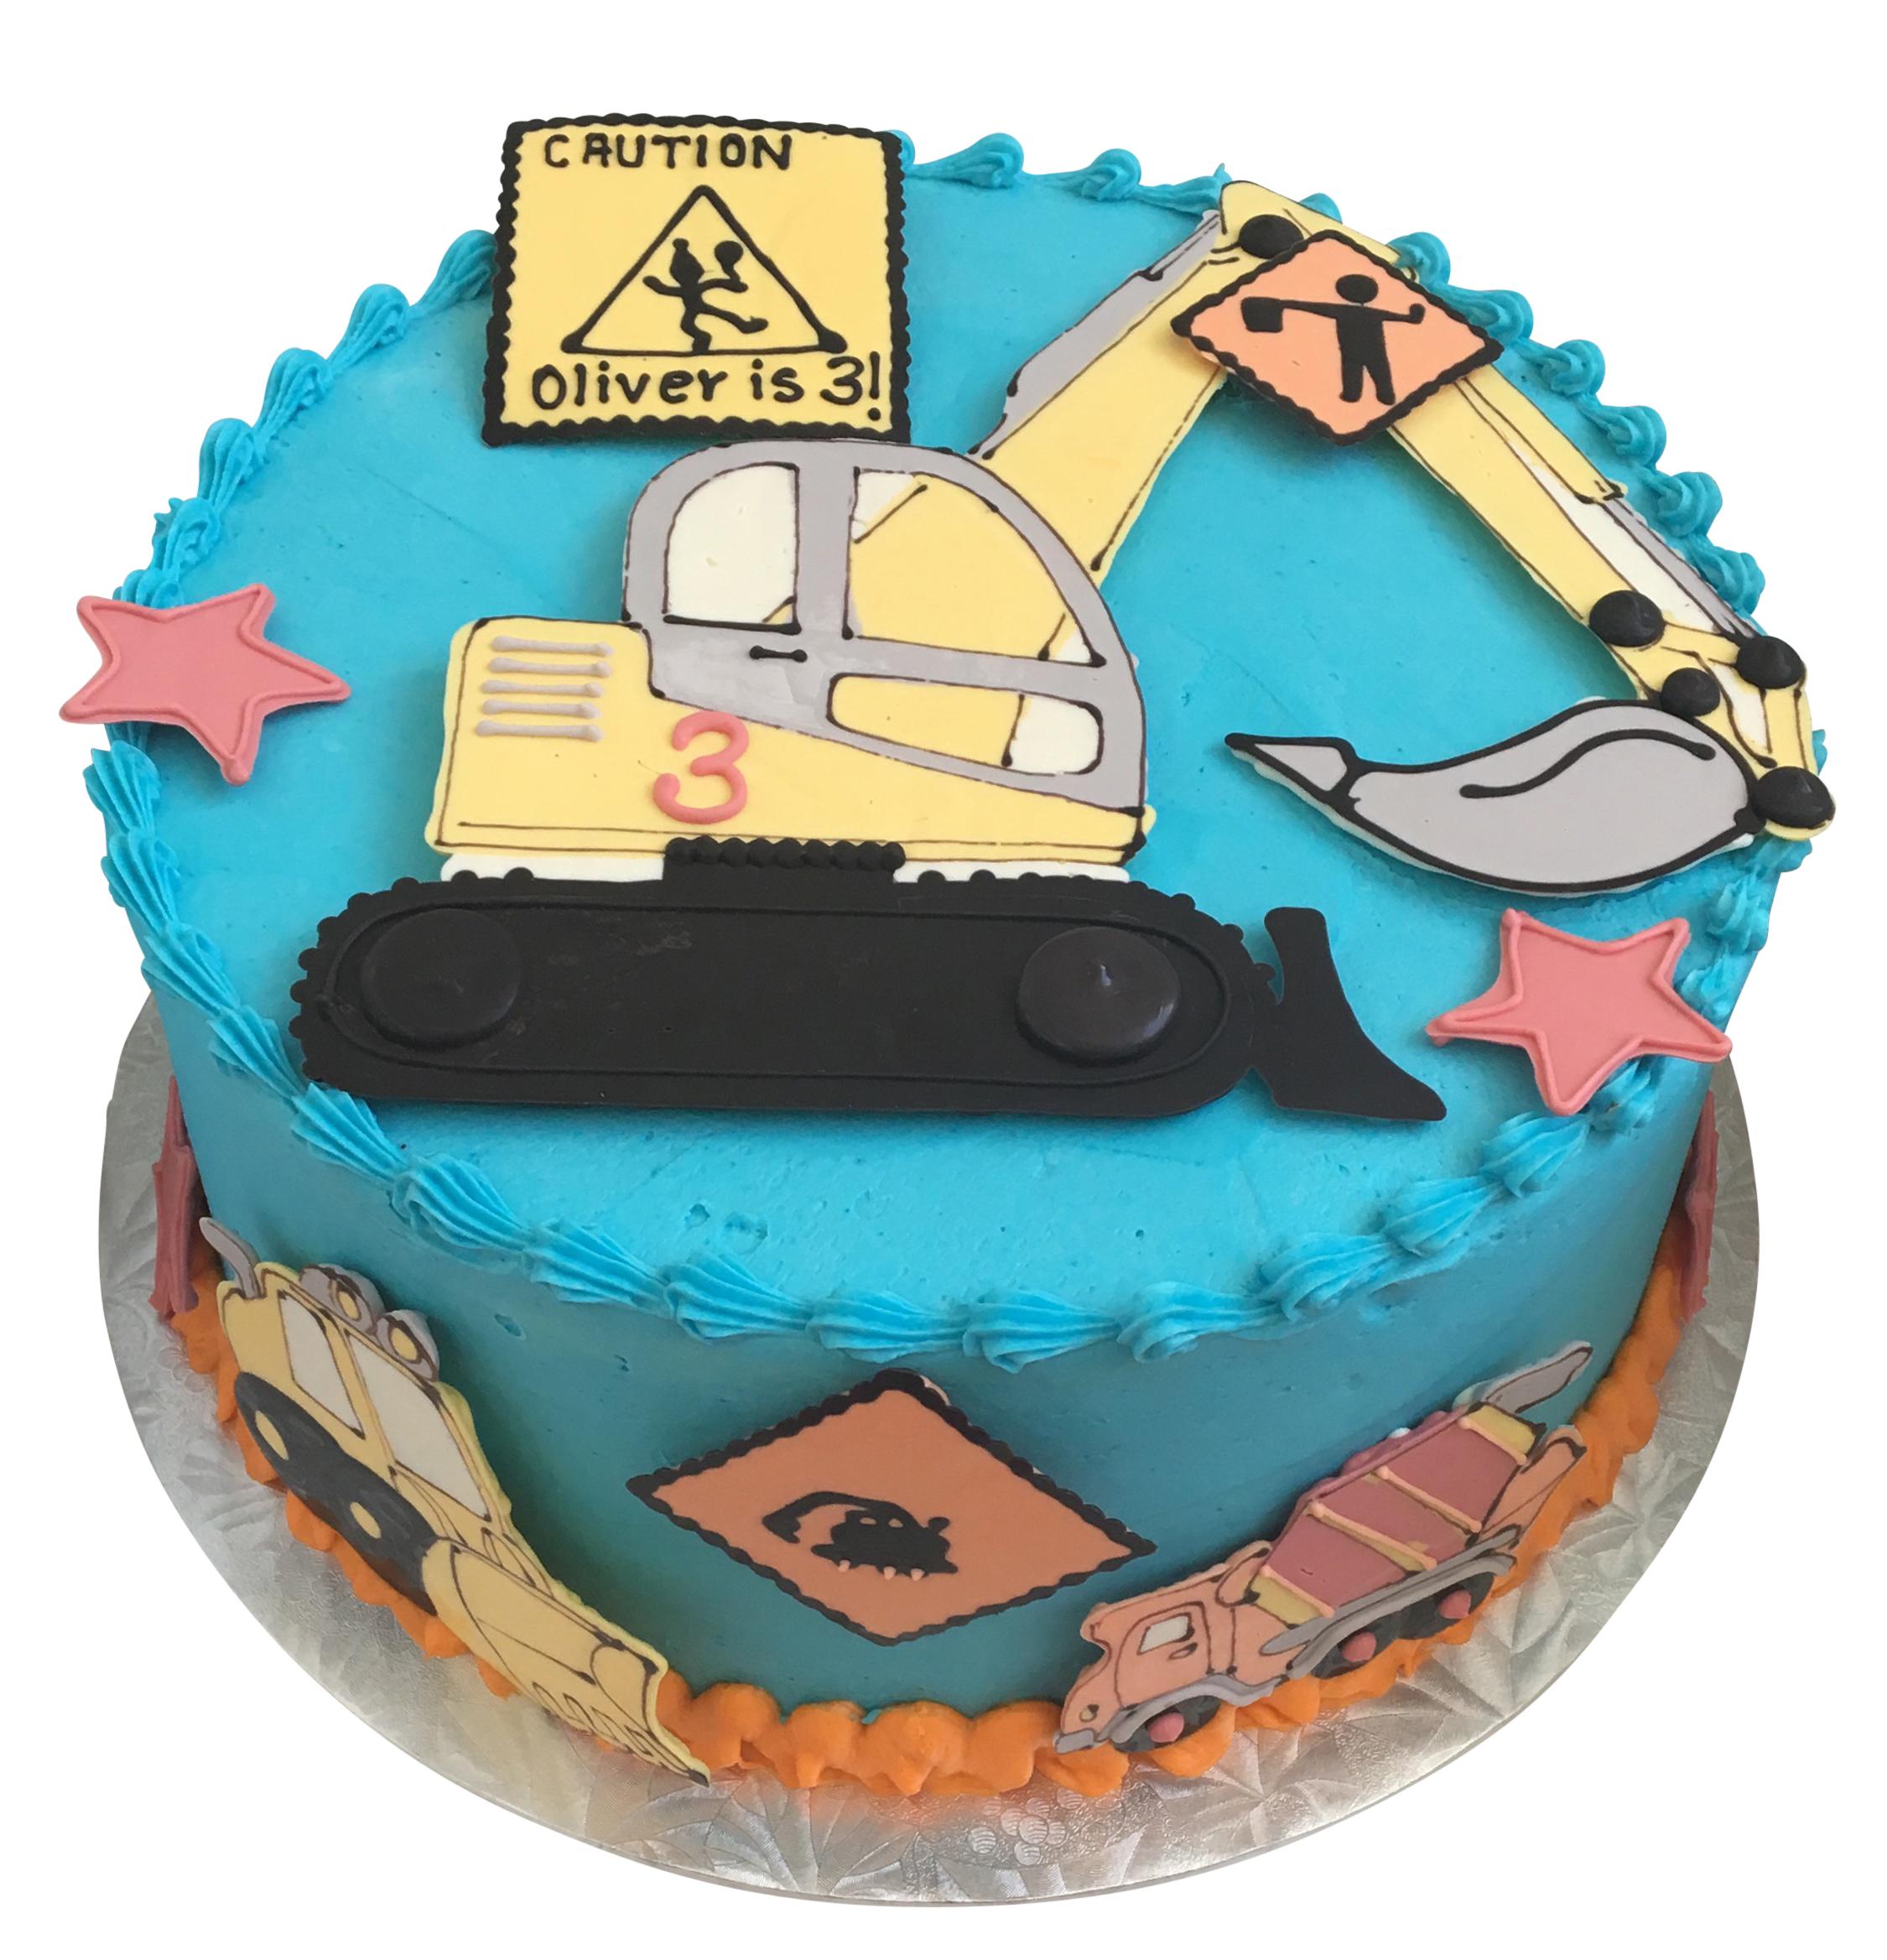 BeBe-Cakes-Construction-Cake.jpg